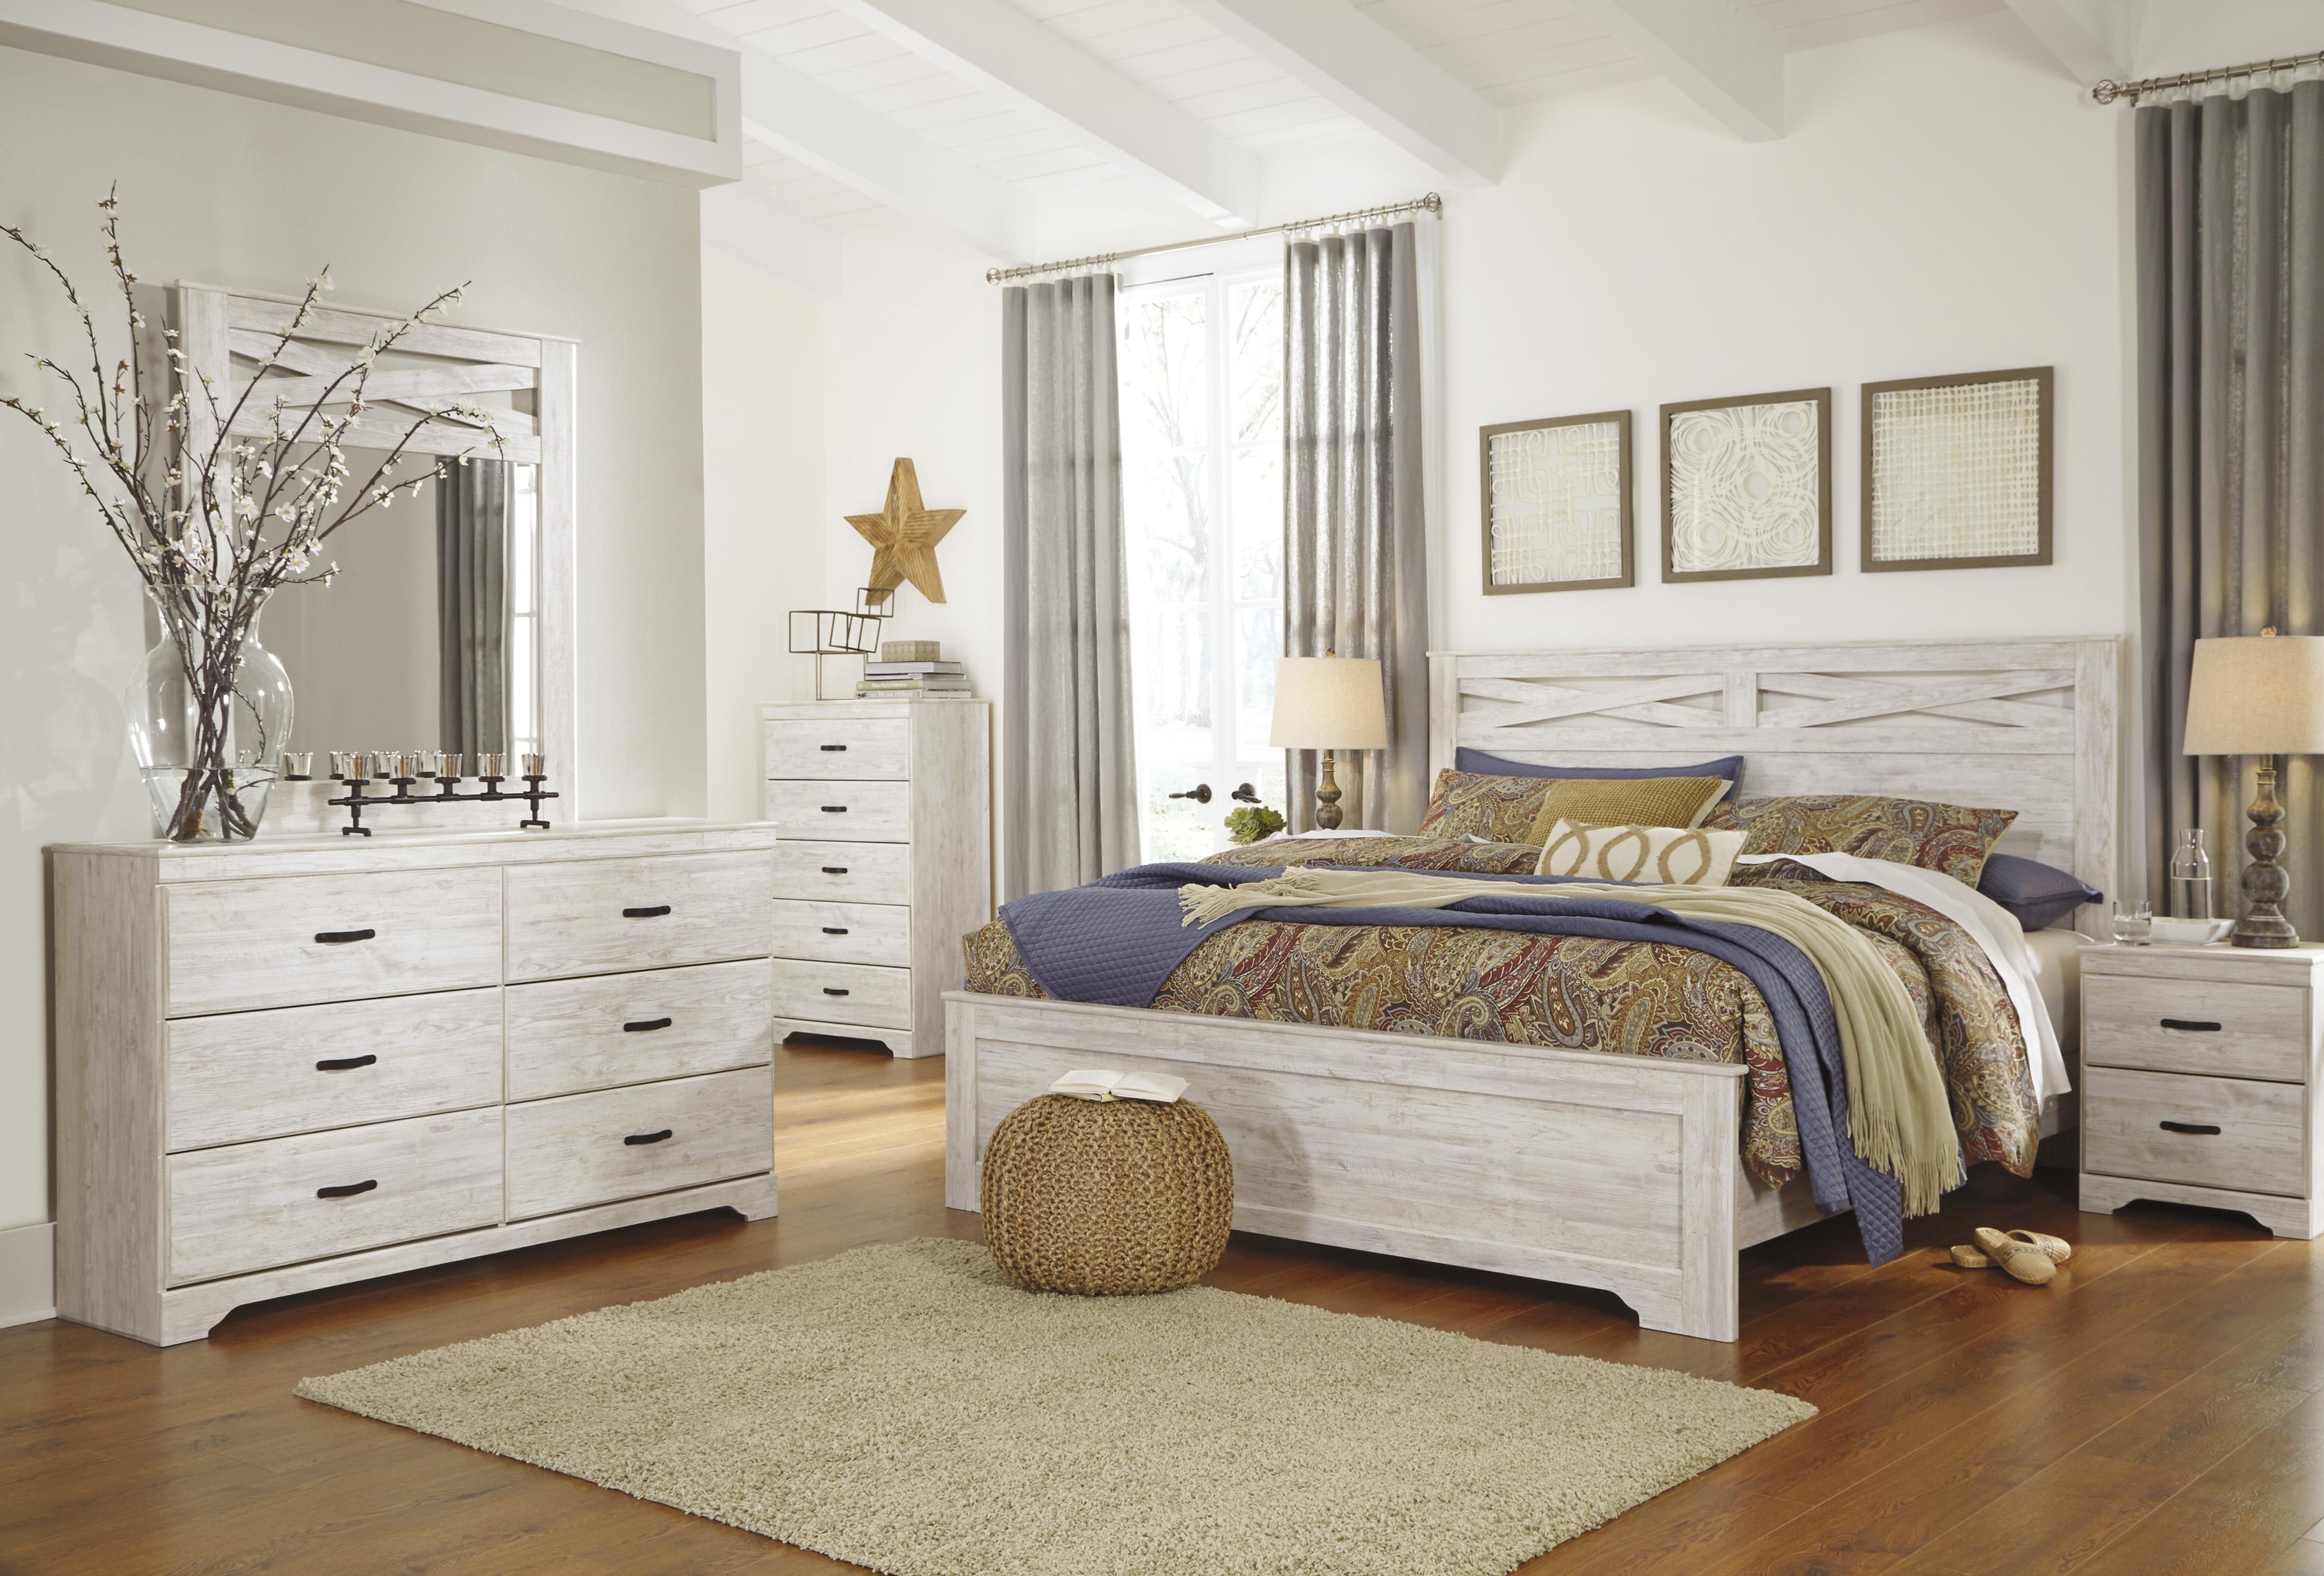 Briartown whitewash bedroom set marjen of chicago chicago discount furniture for Whitewash bedroom furniture sets